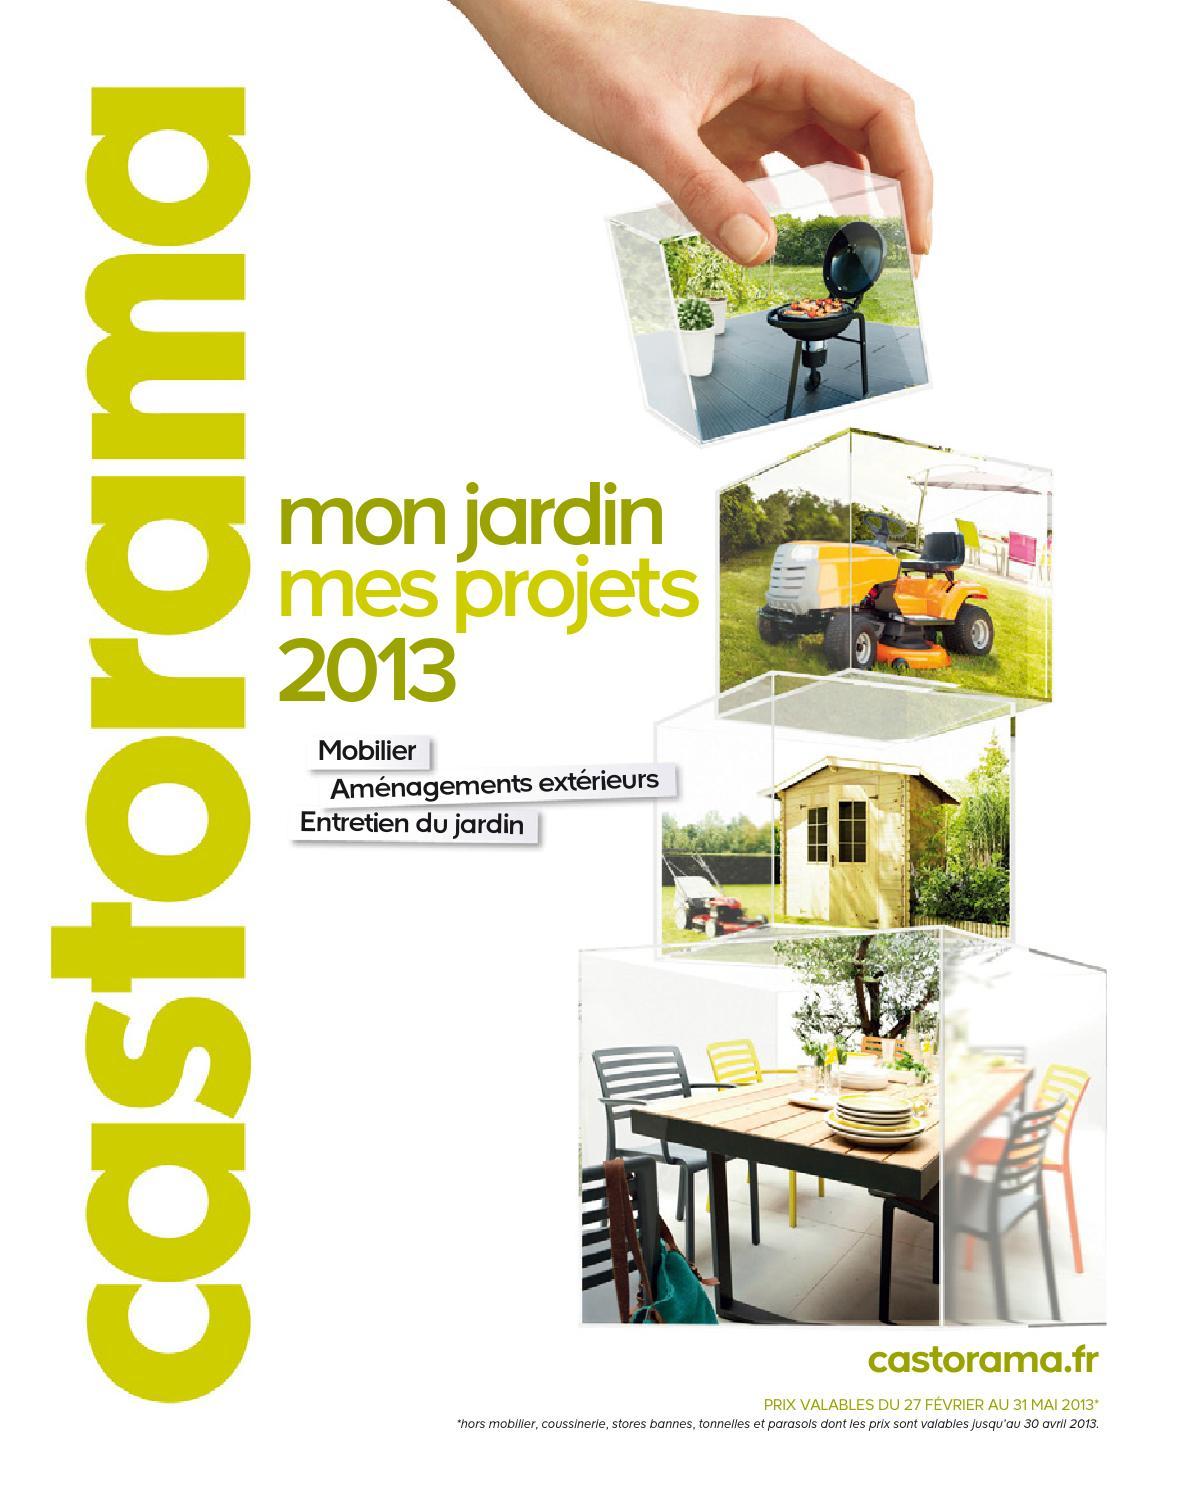 Nez De Marche Terre Cuite Castorama - Idees Conception Jardin | Idees Conception Jardin